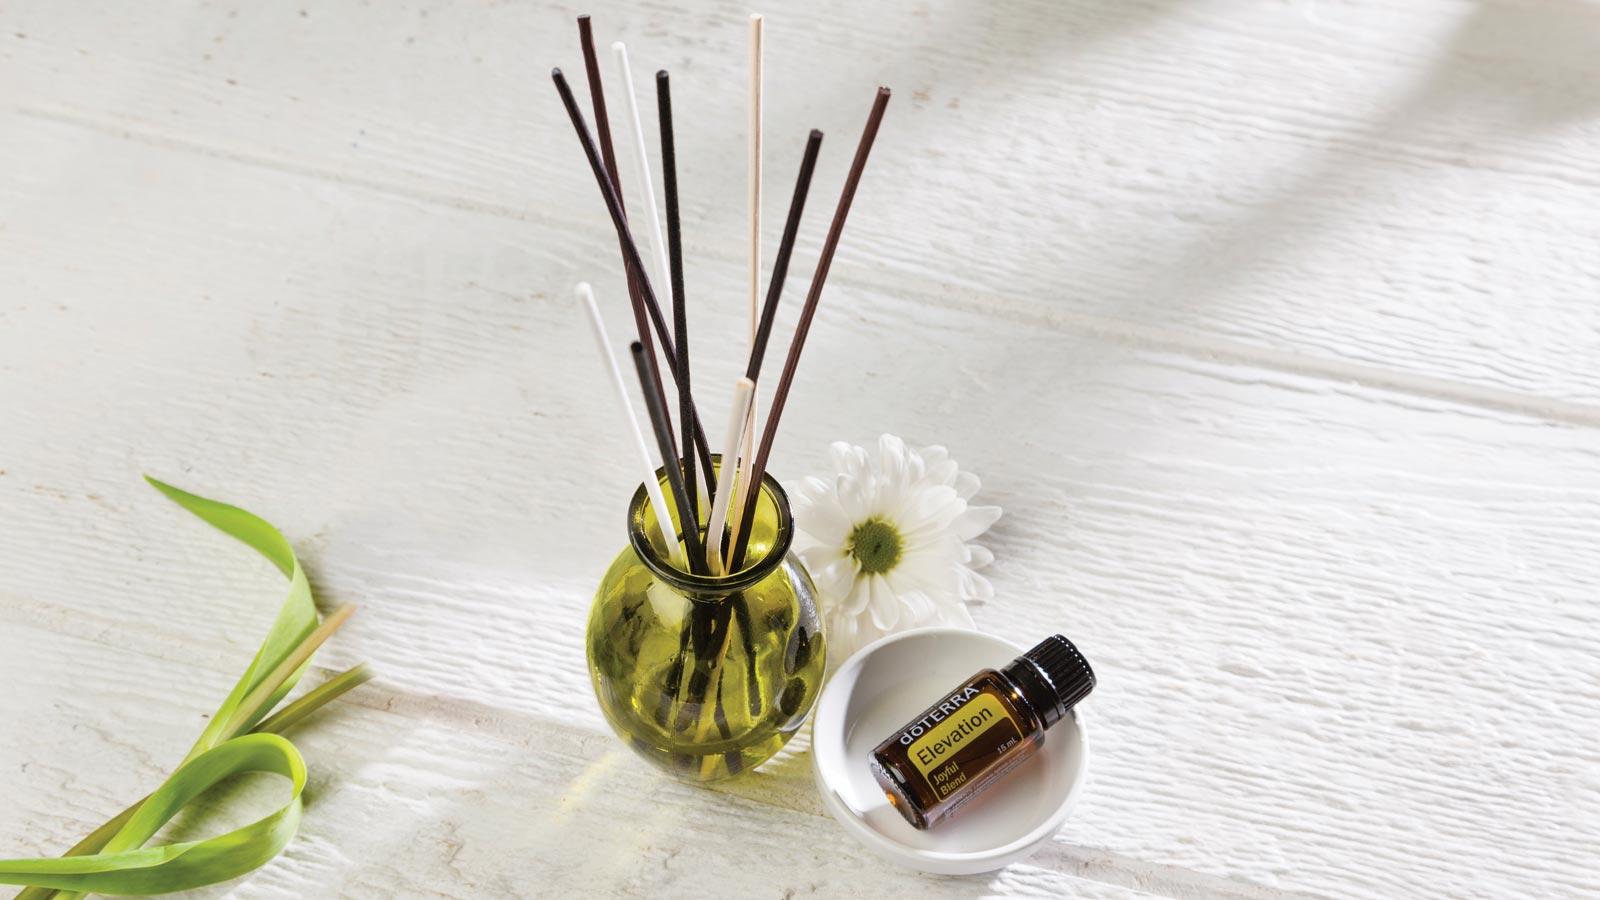 Diy reed essential oil diffuser d terra essential oils for Decorative diffuser